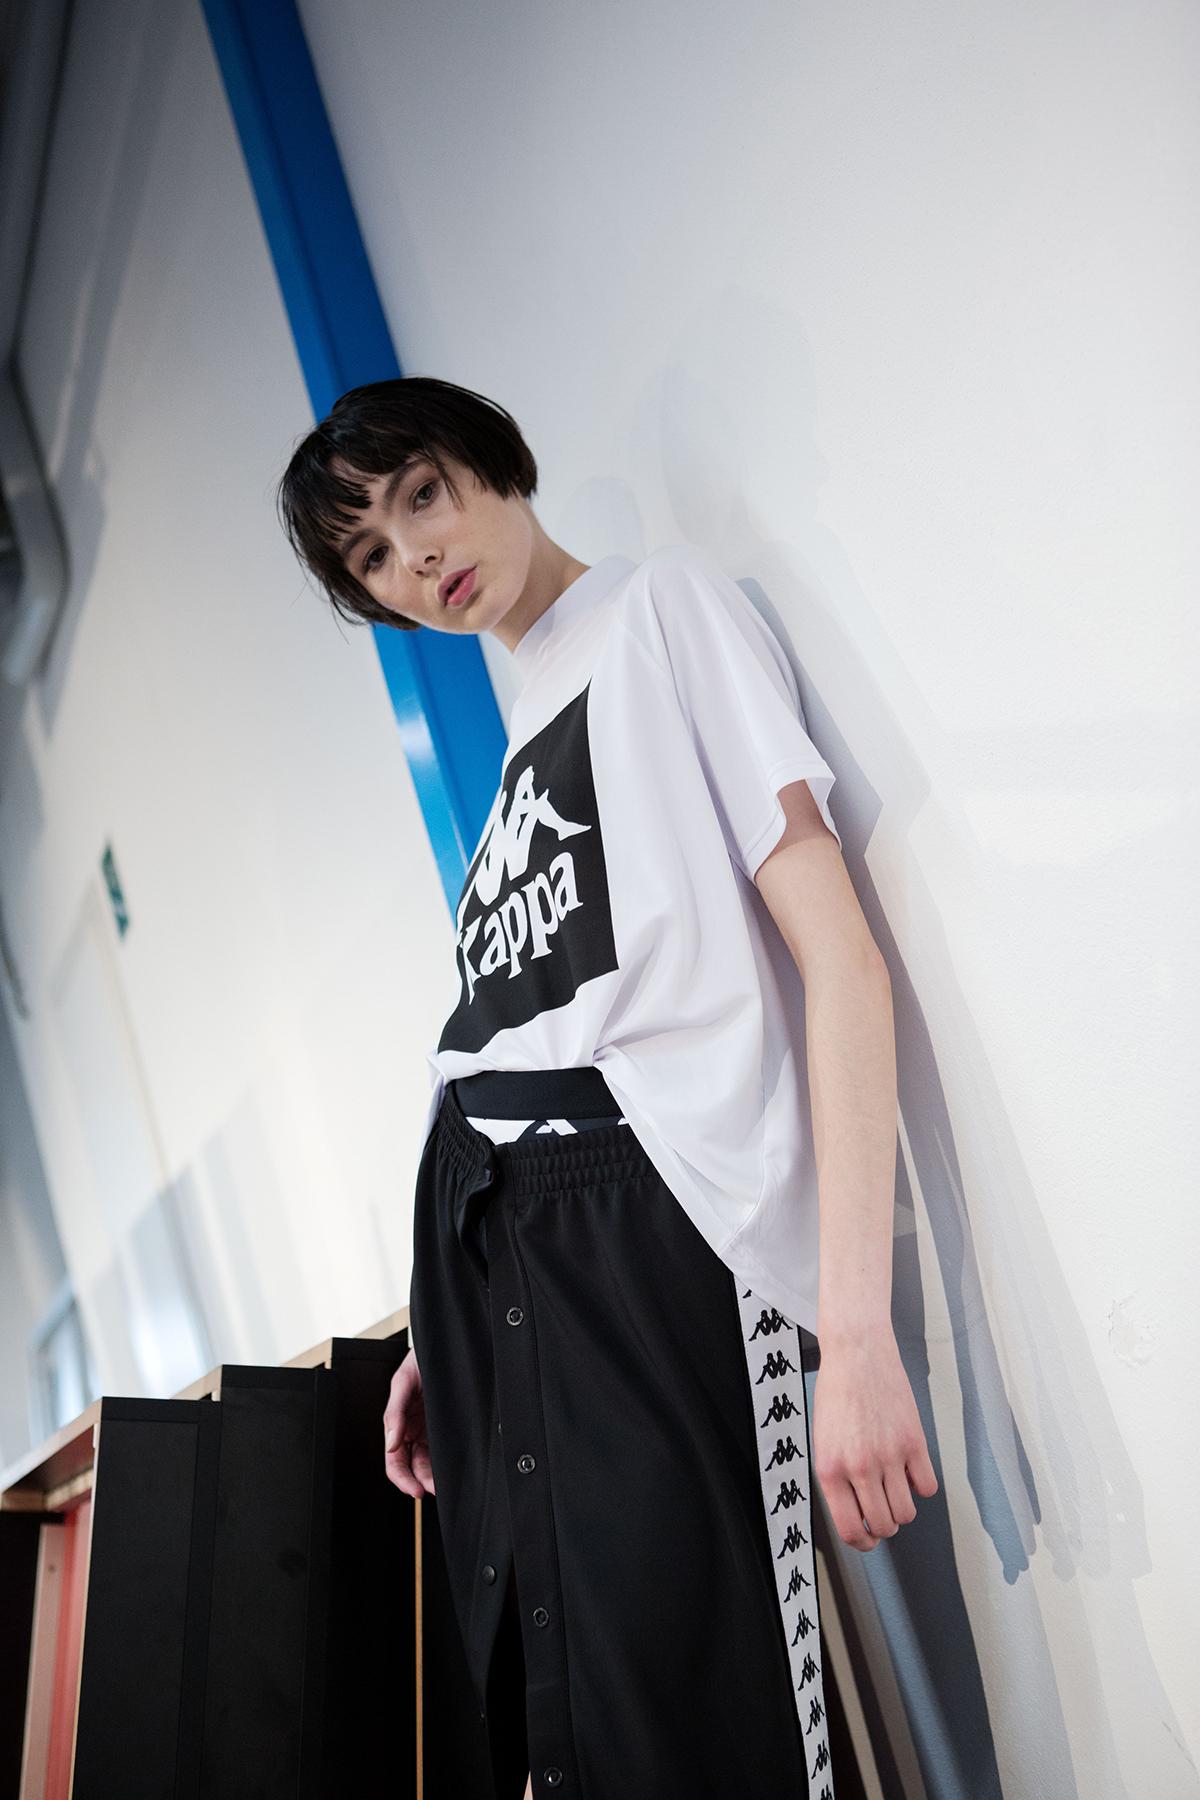 10_kappa_runway_editorial_fashion_federica_borgato